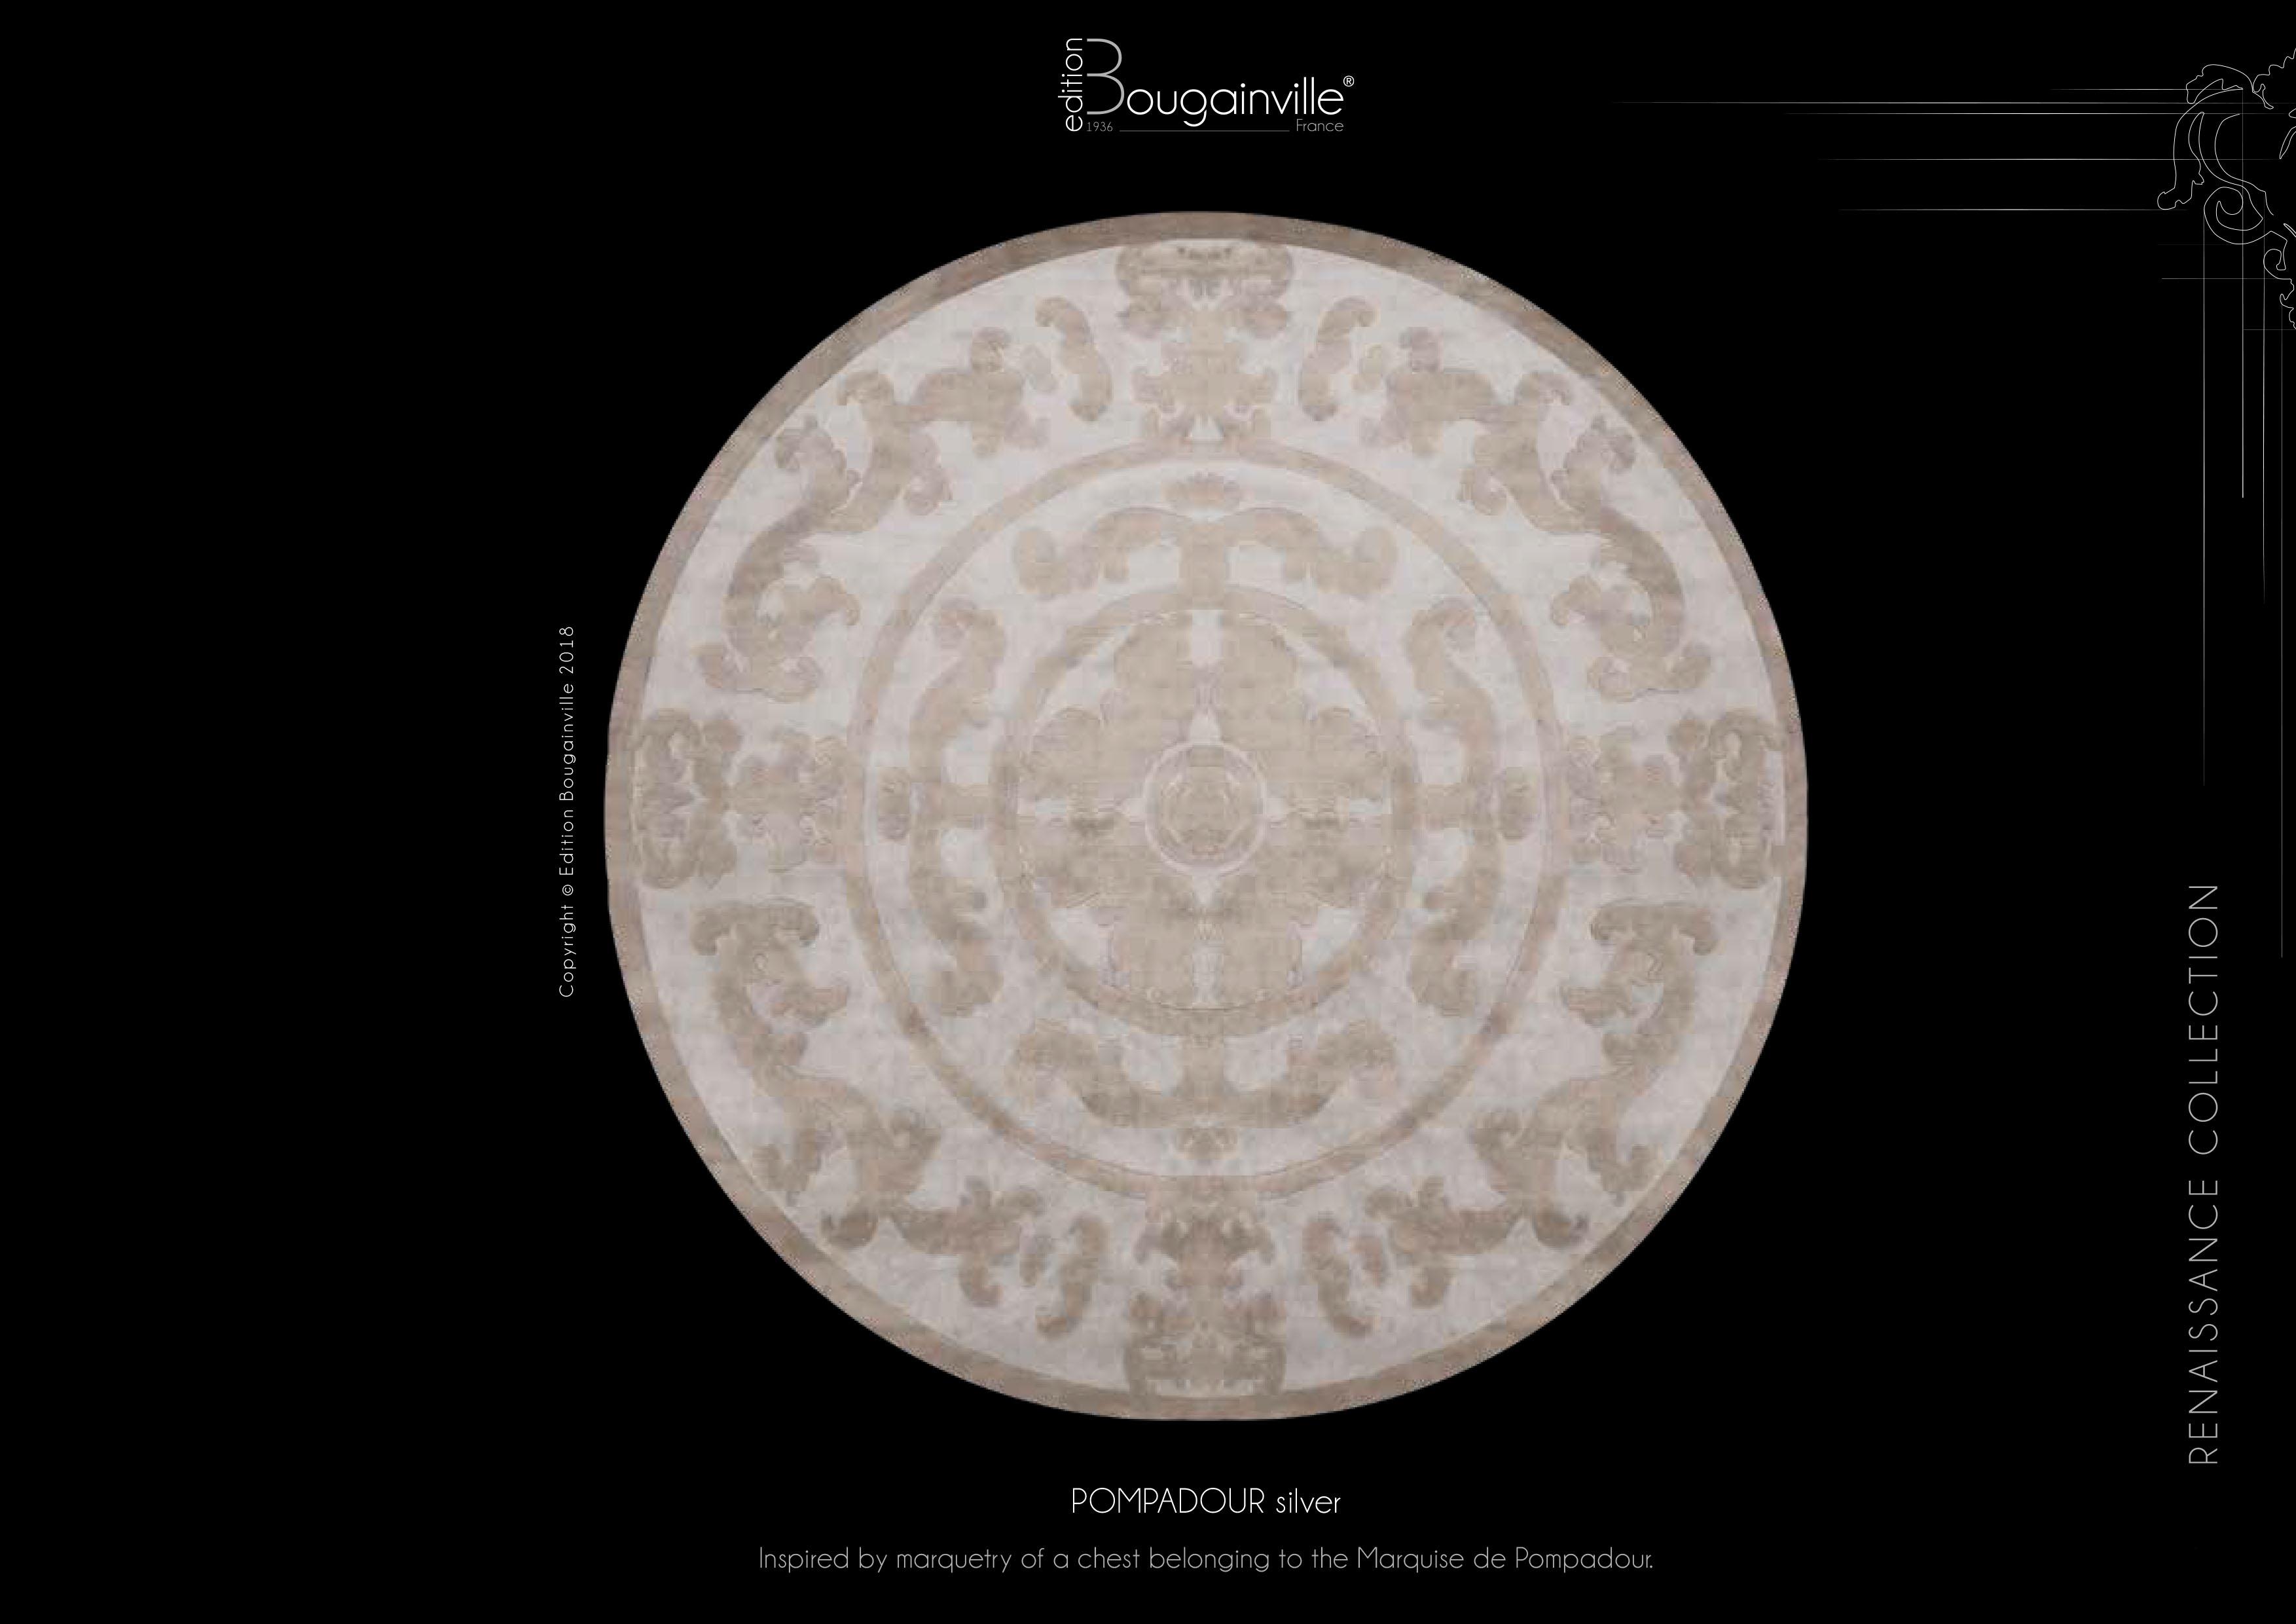 Ковер Edition Bougainville, POMPADOUR silver